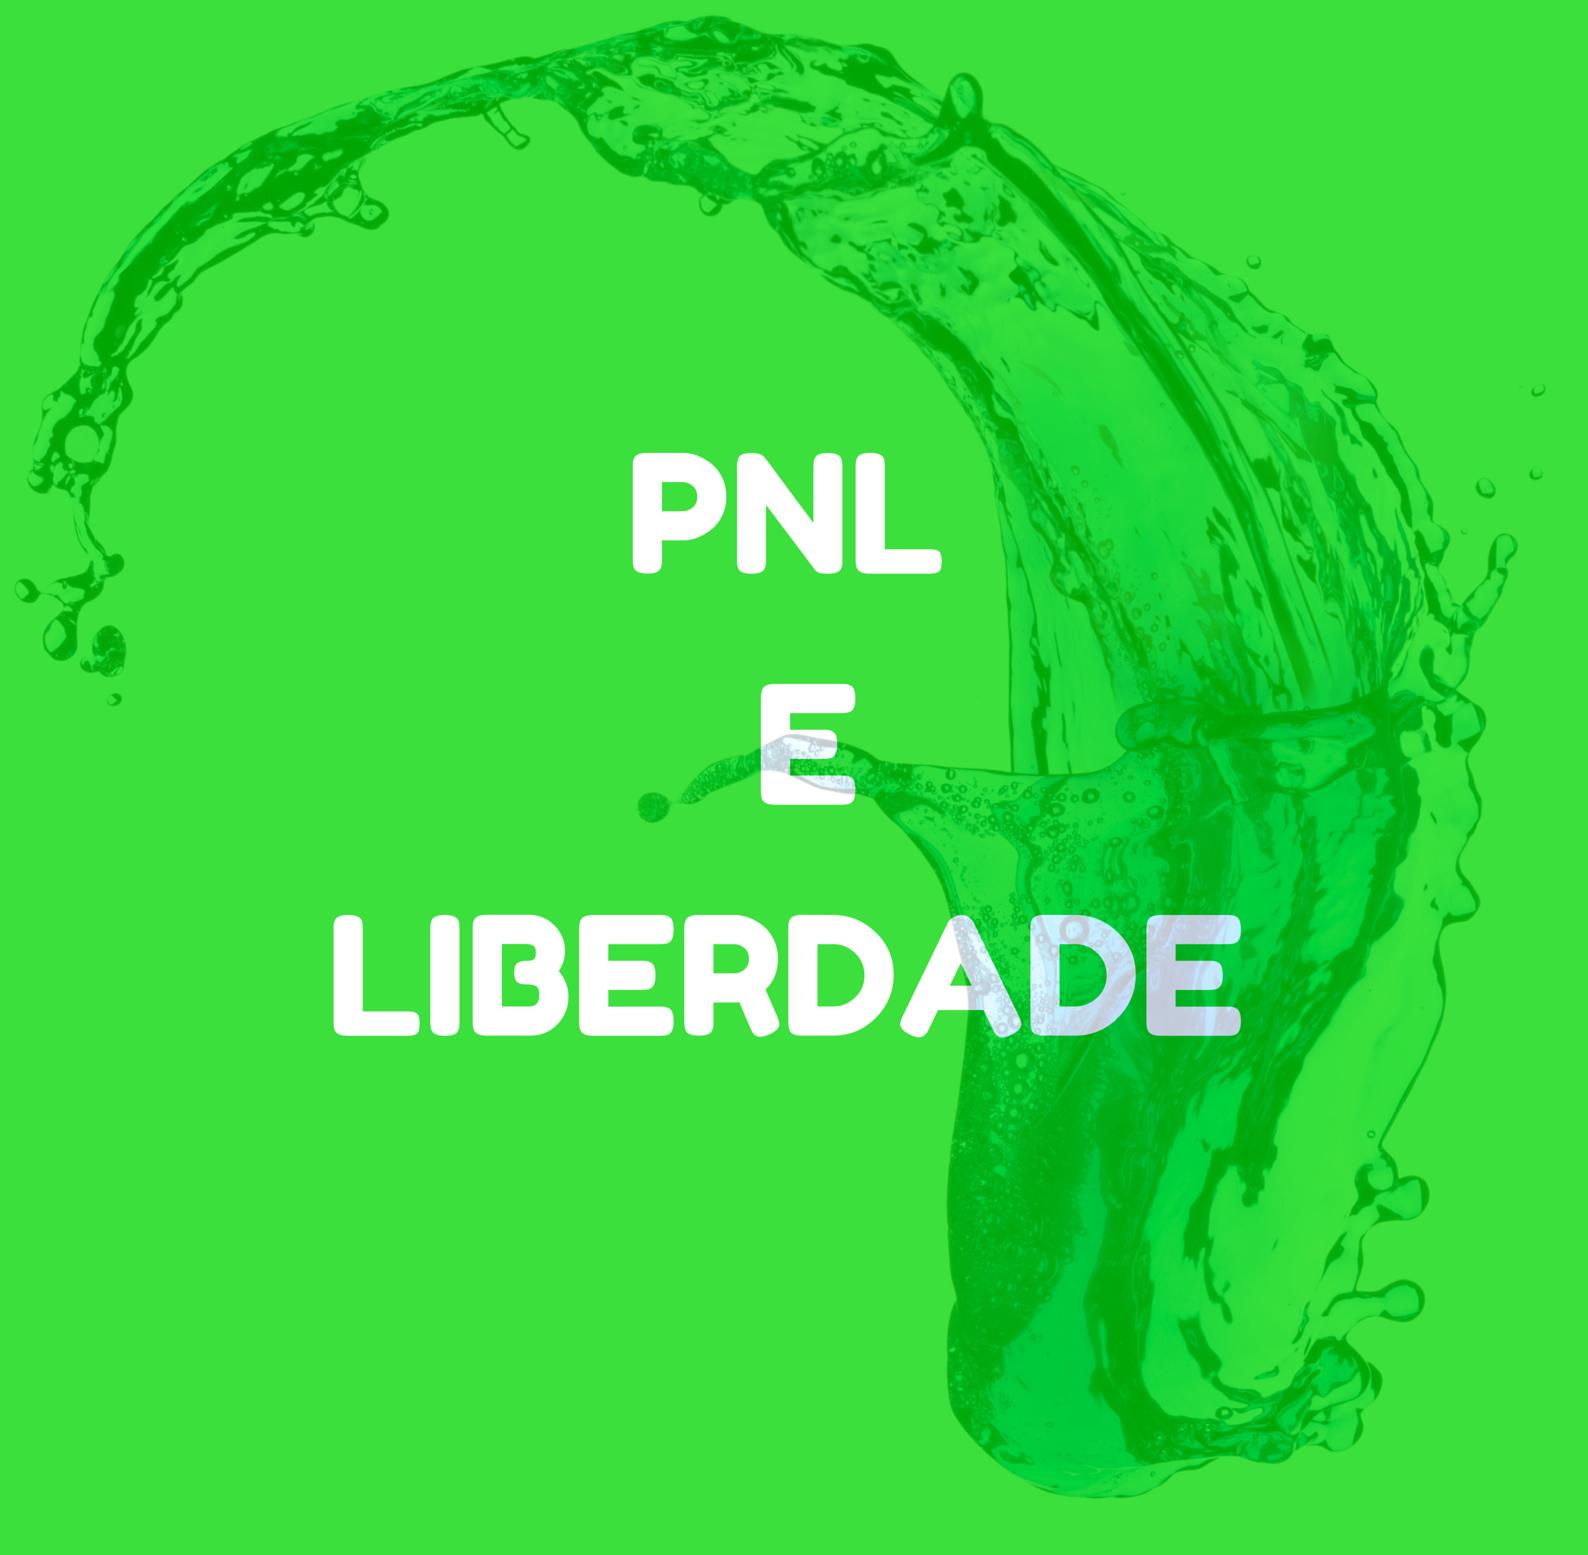 PNL e liberdade